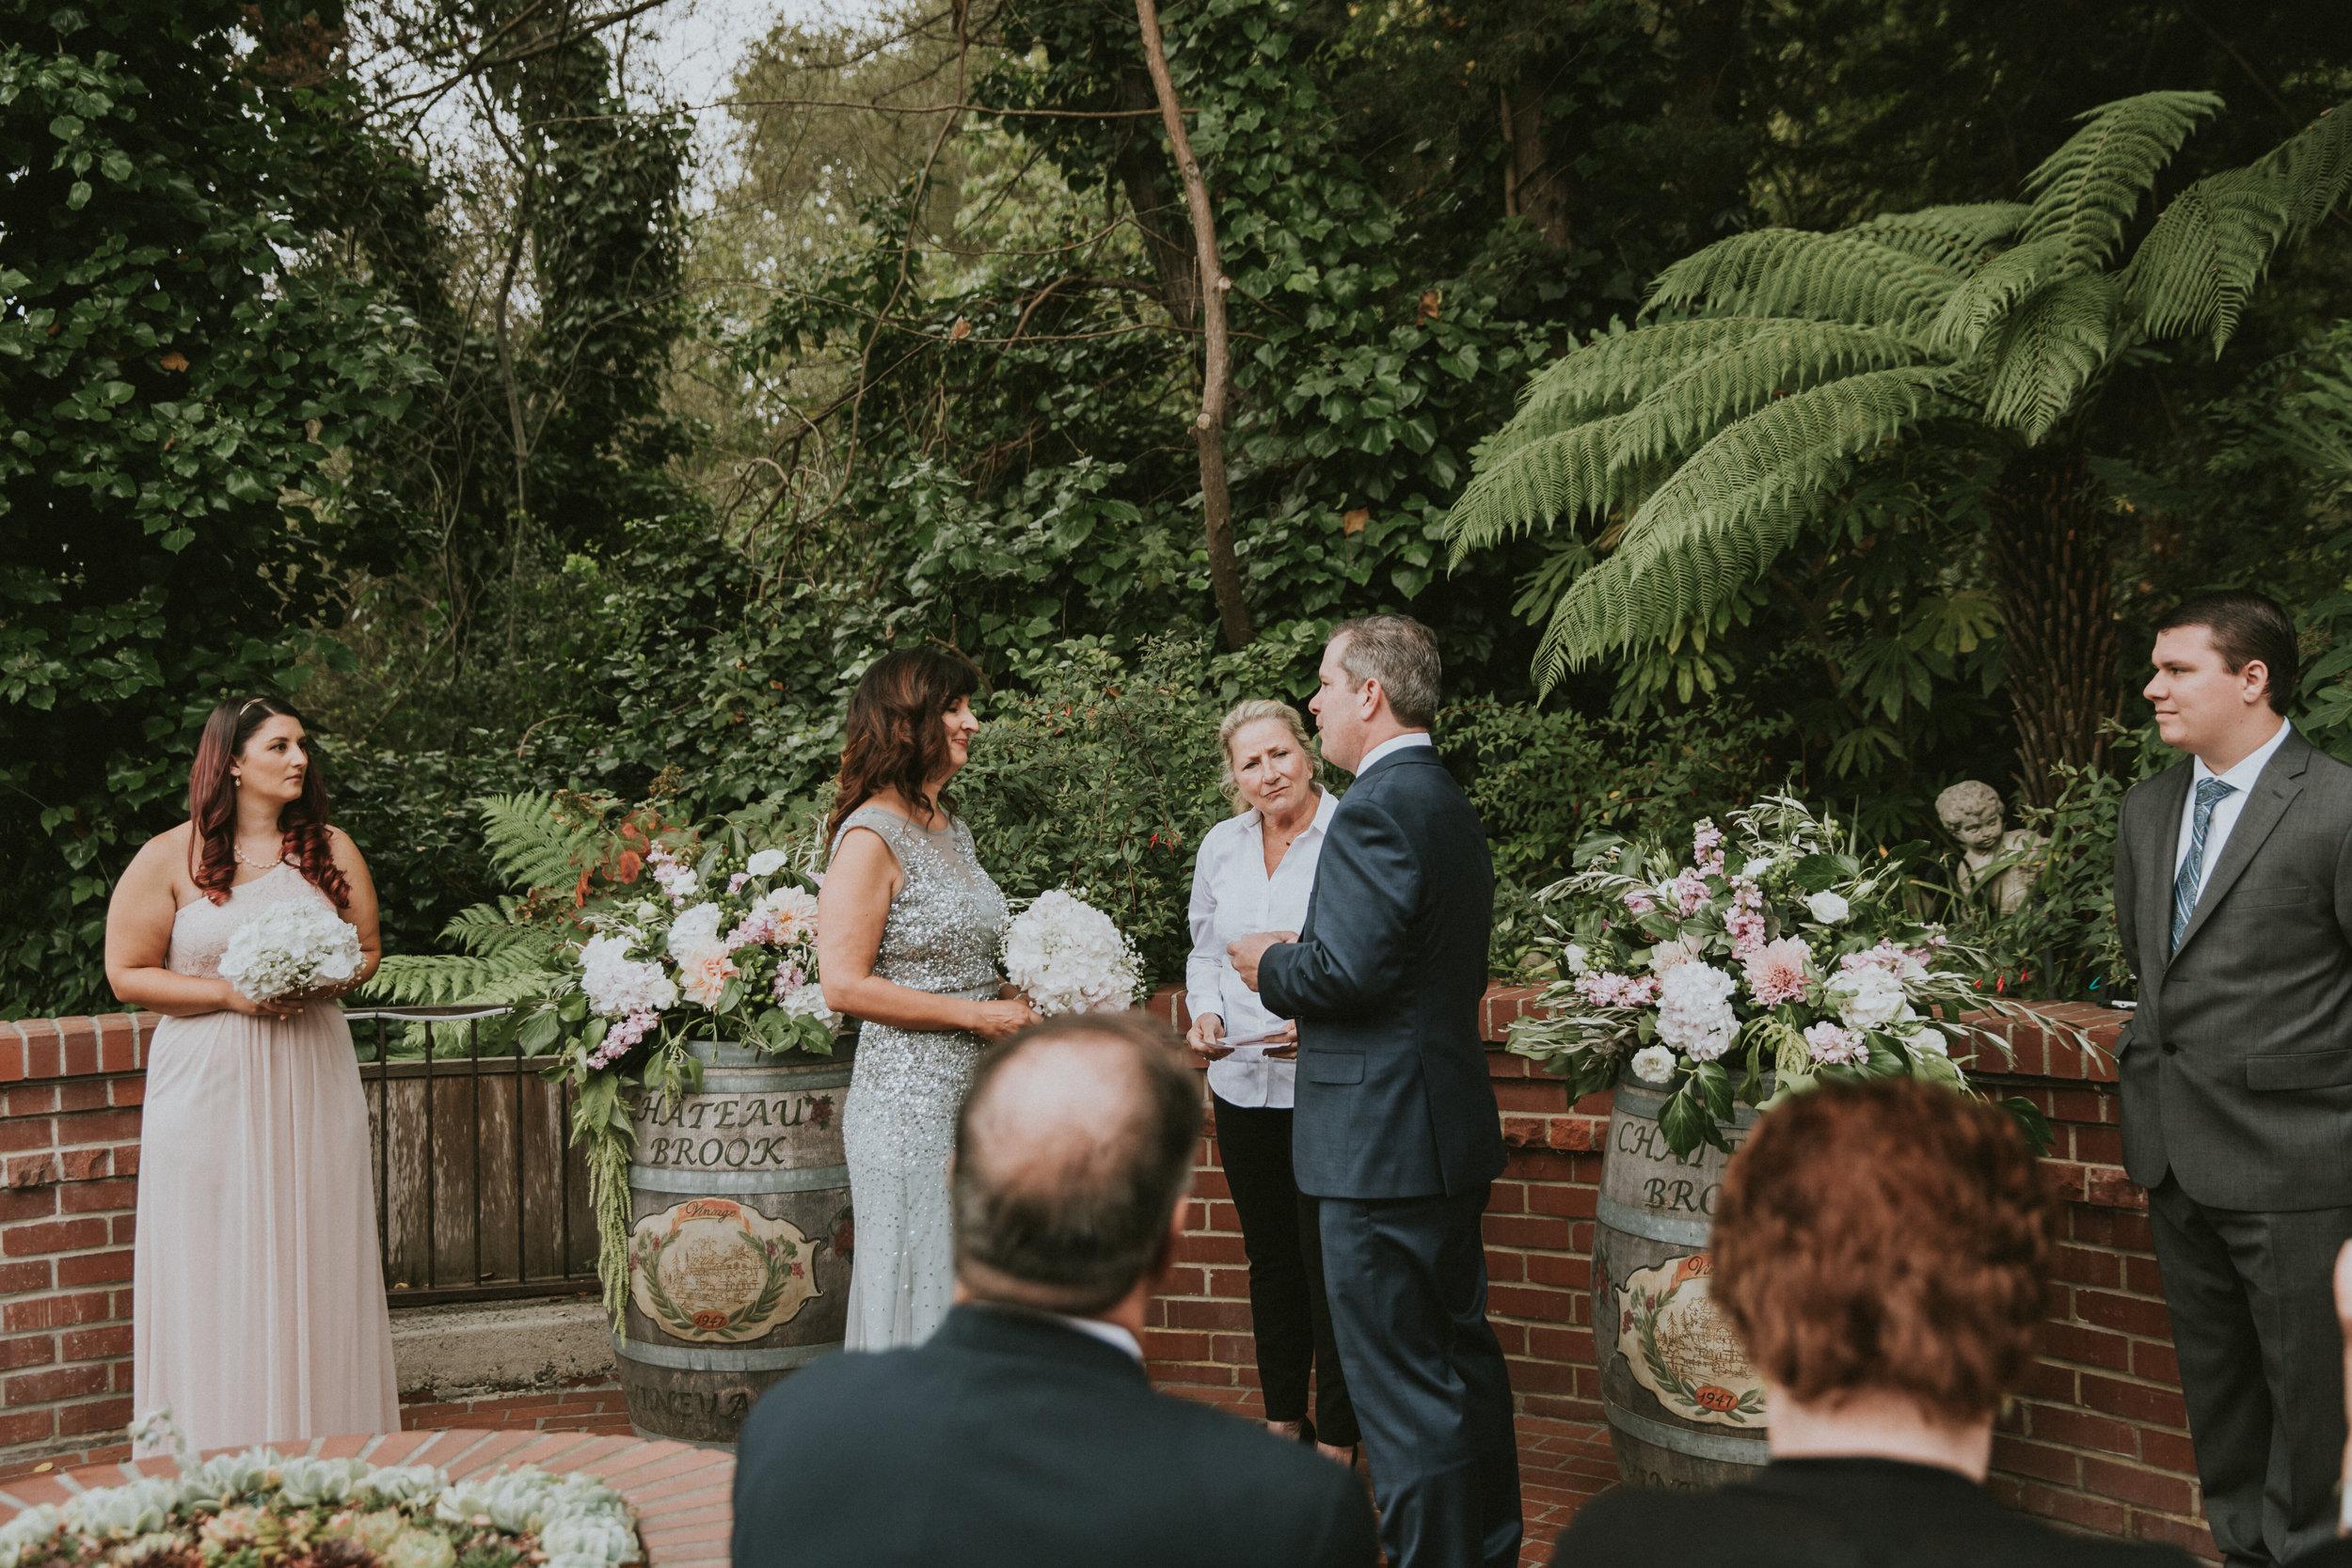 Capitola-Santa-Cruz-wedding-photographer-171.jpg